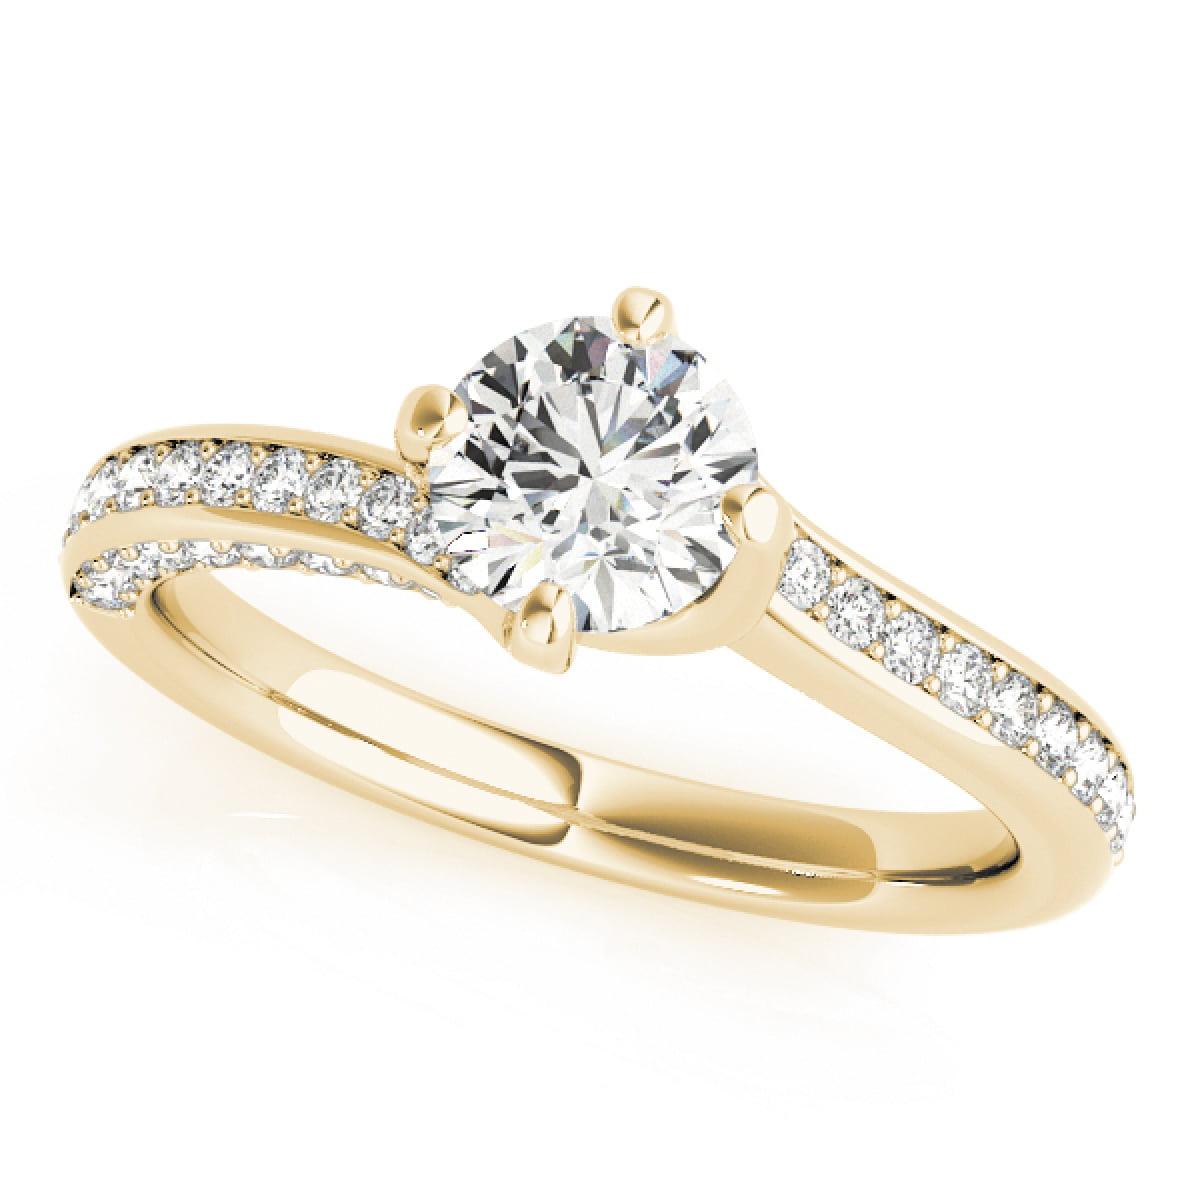 MauliJewels - 0.90 Ct Classic Diamond Engagement Wedding ...